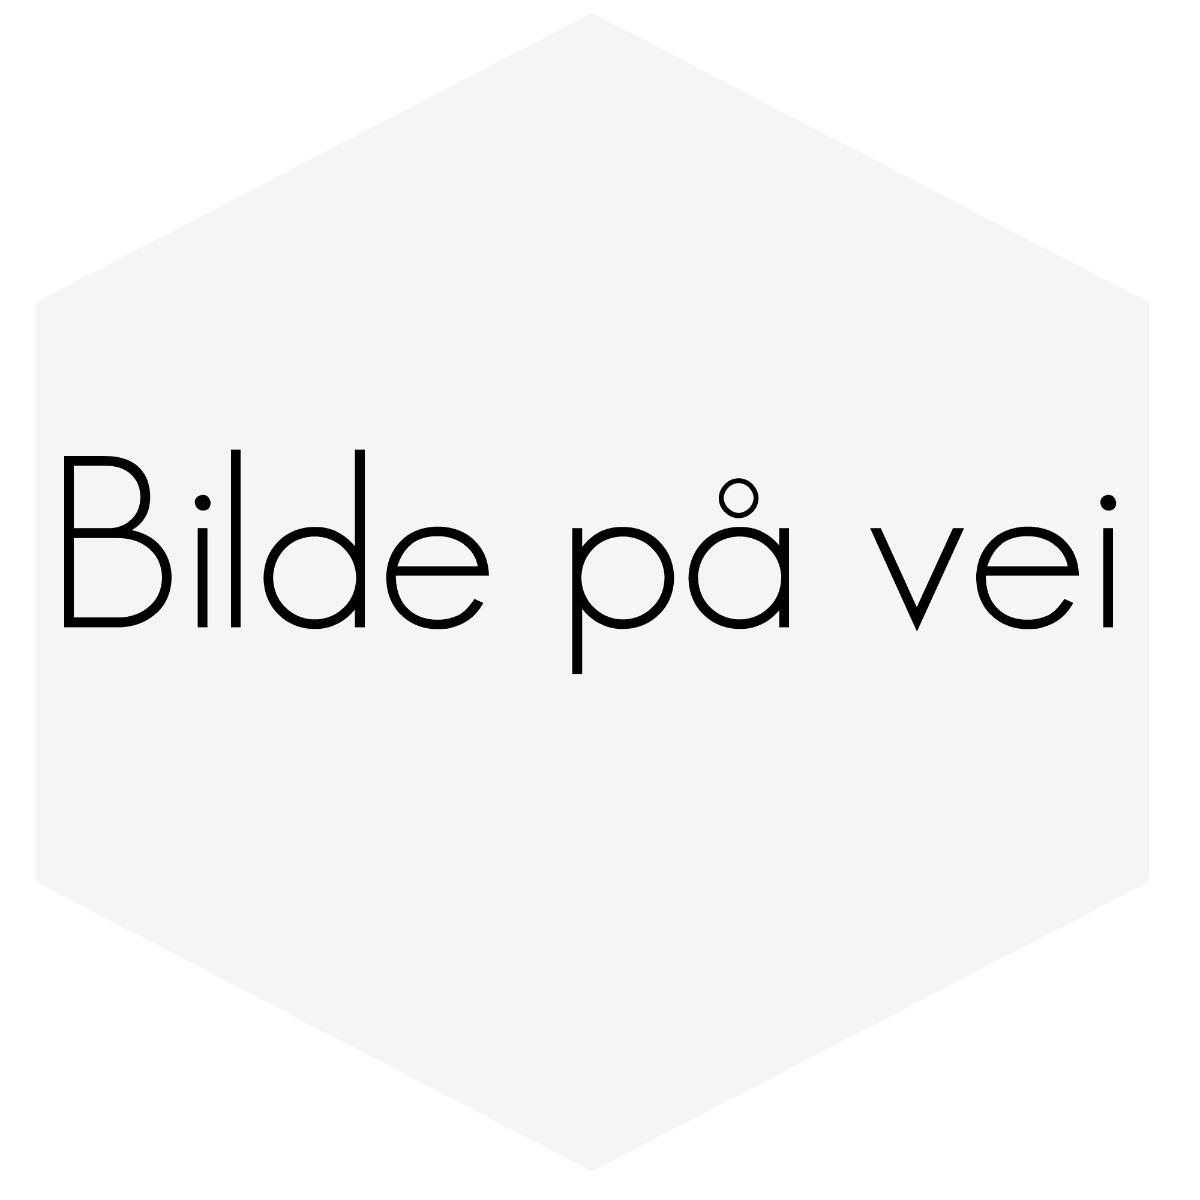 FORING YTRE-FREMRE PÅ BAKAKSEL 850-S/V70 3516122 BILLIG TYPE